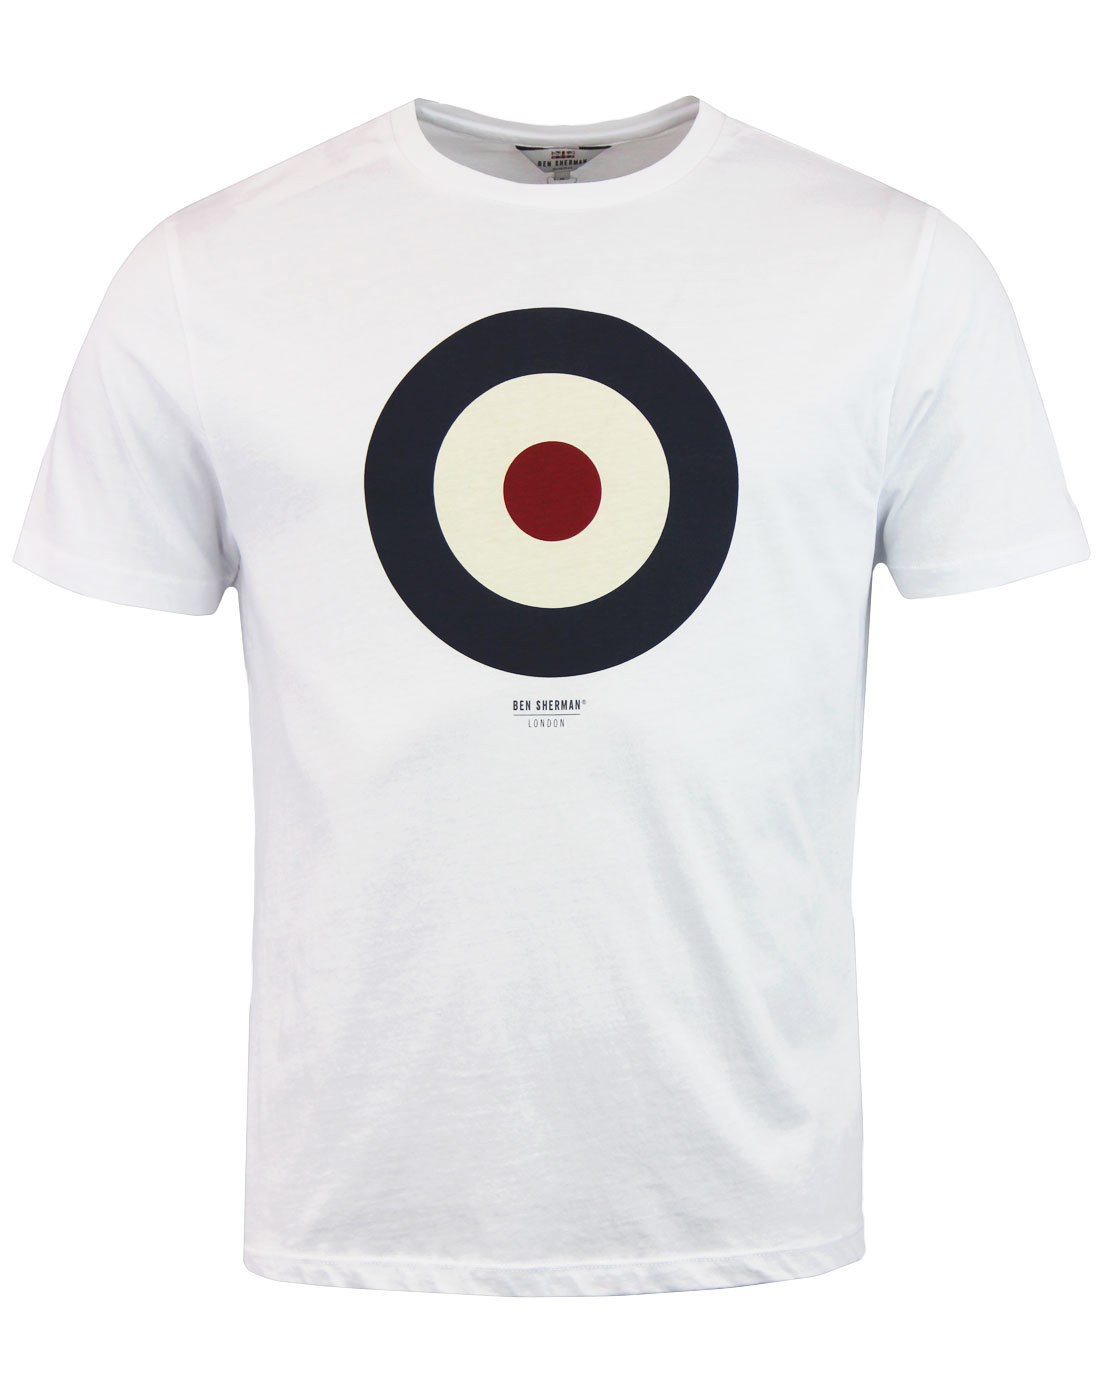 Perceptible gritar gritar  BEN SHERMAN Keith Moon Retro 1960s Mod Target T-Shirt in White